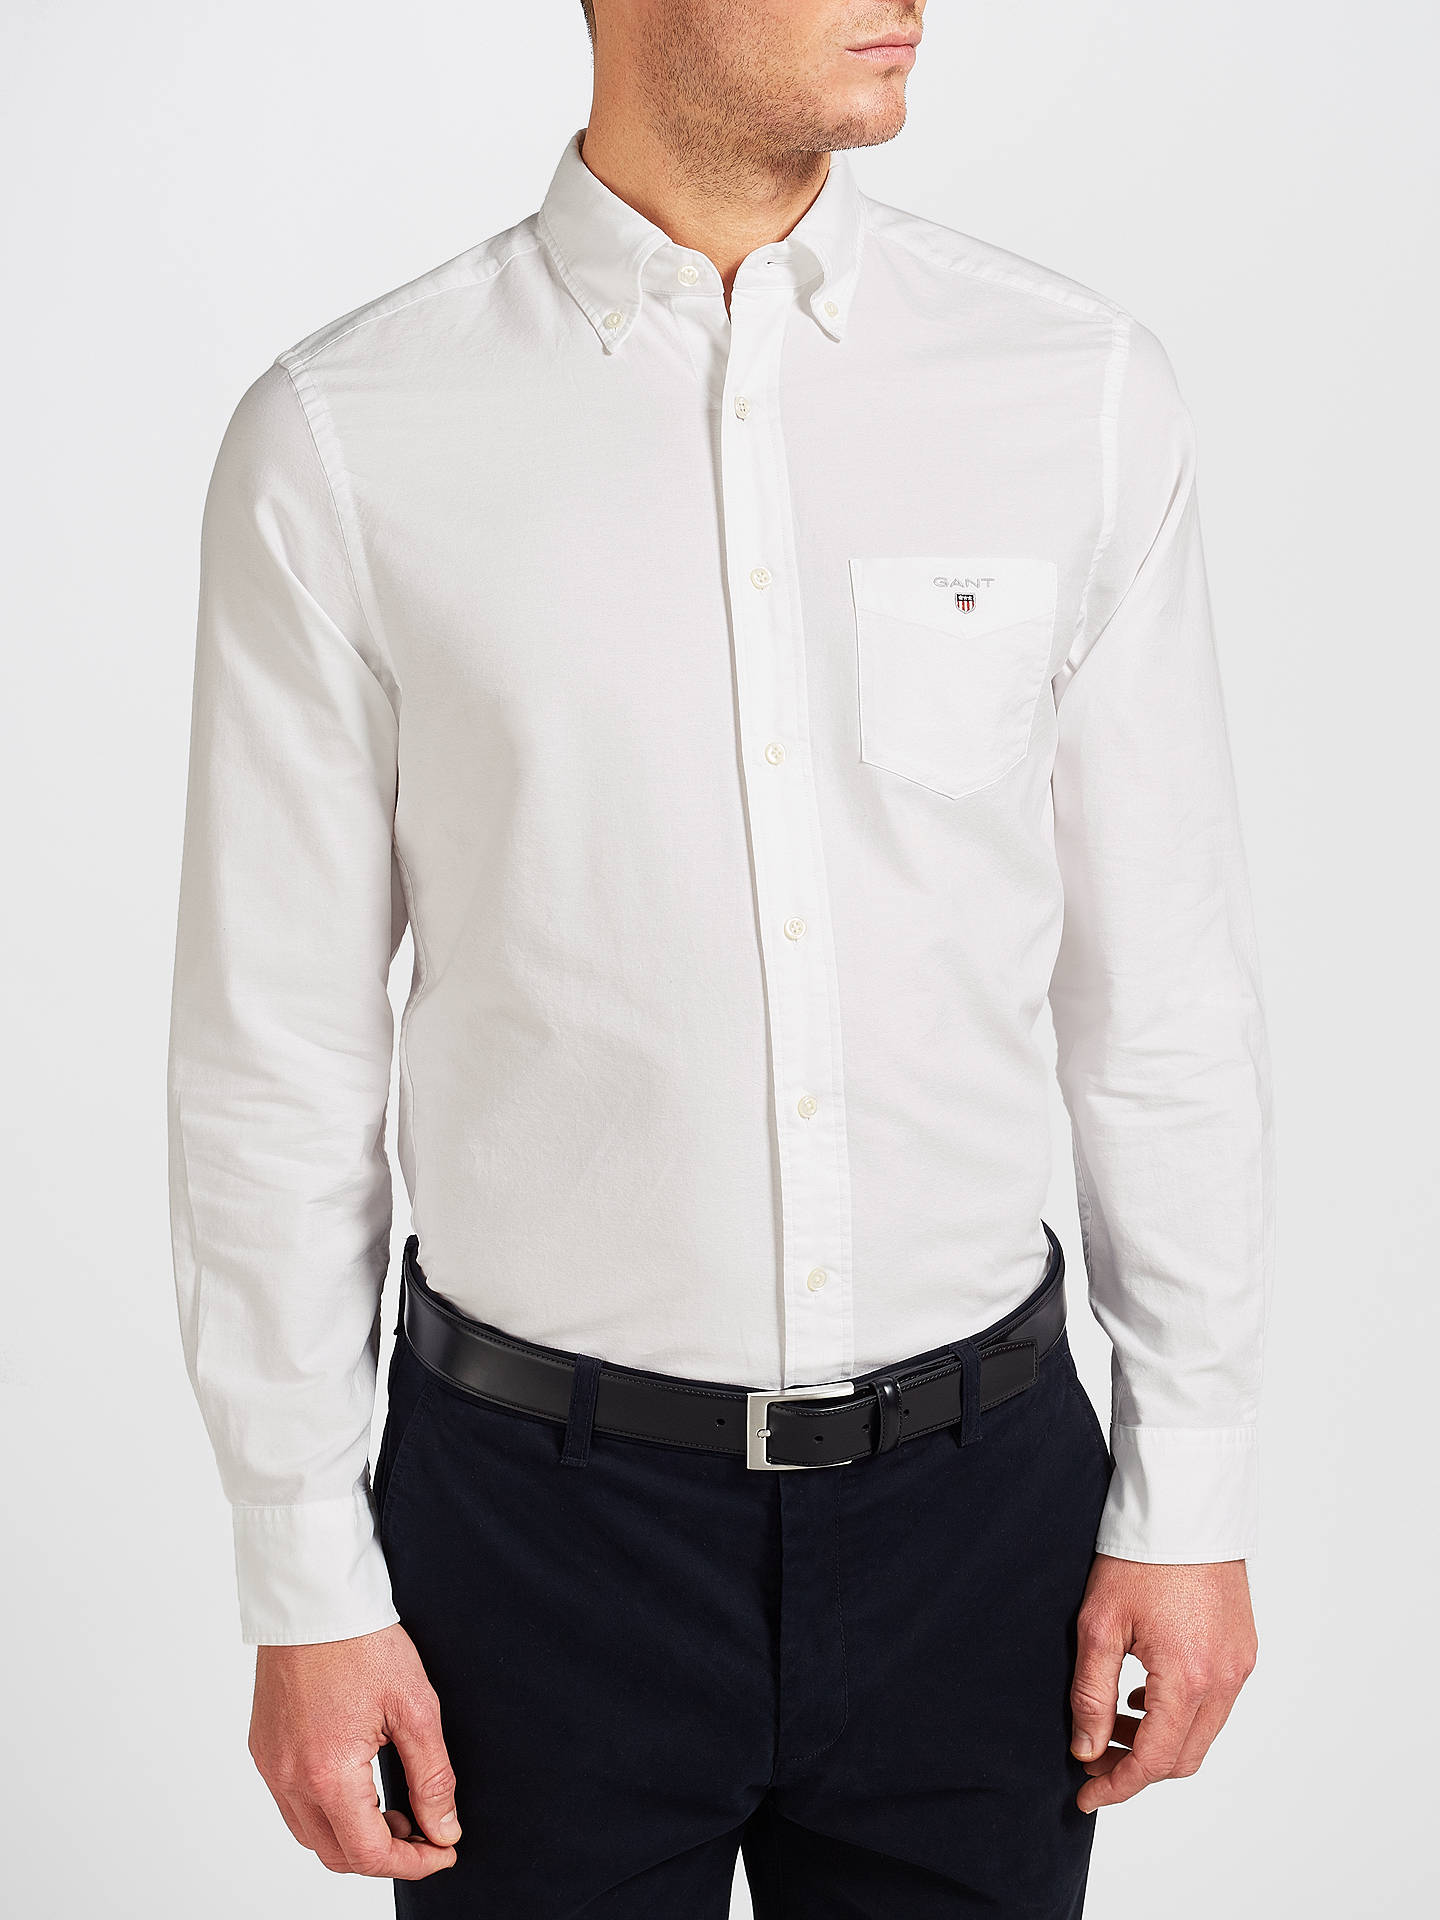 b4cbd05e2 GANT Regular Fit Plain Oxford Shirt, White